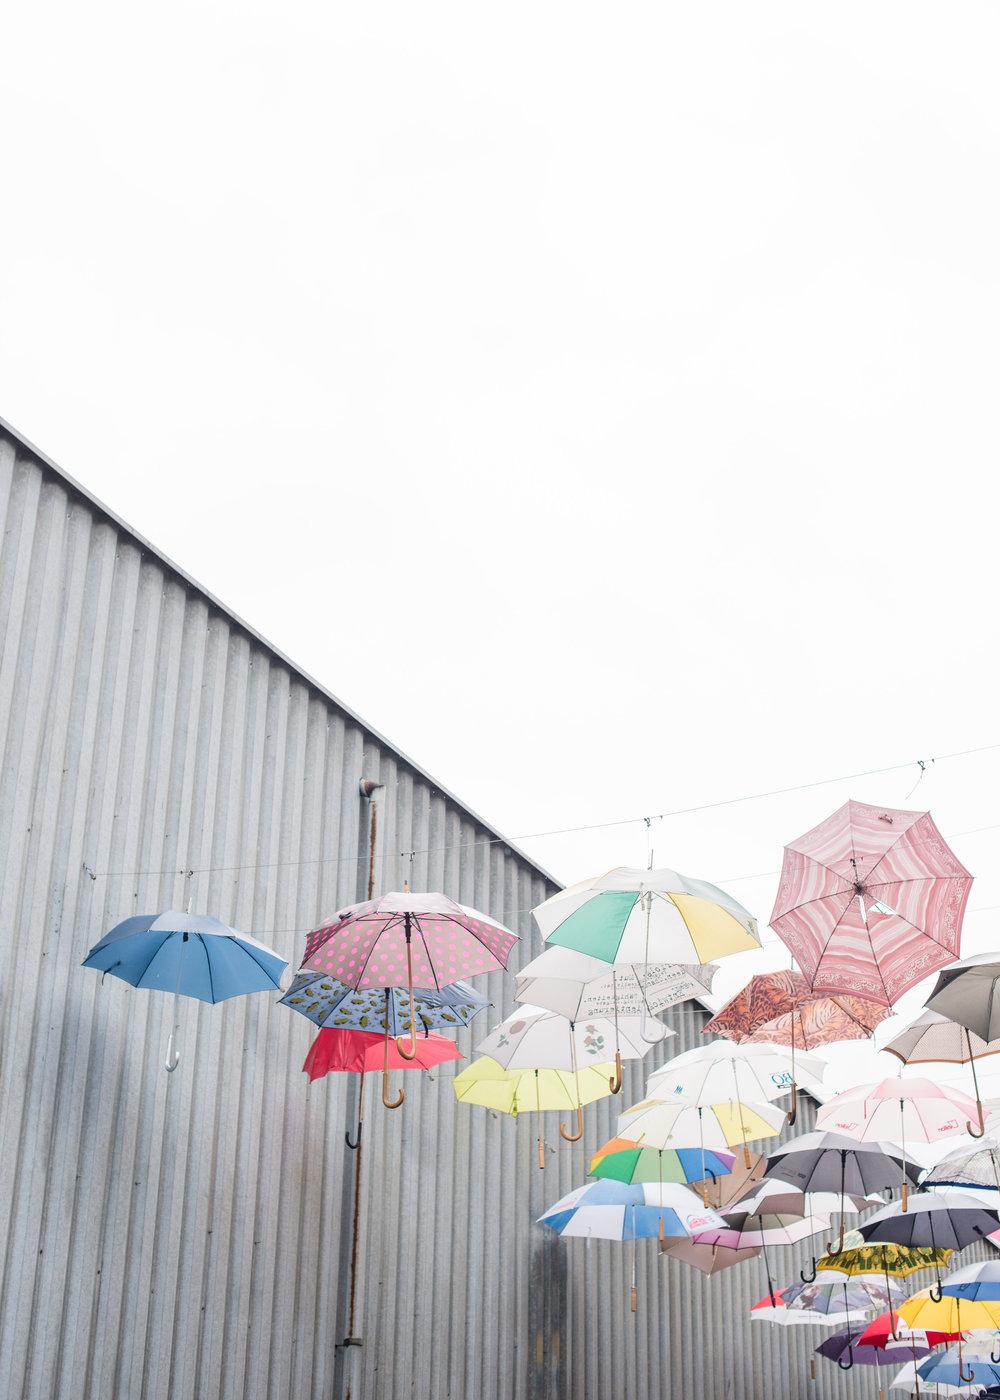 Gerold Cuchi Umbrellas Carley Rudd Travel Photography